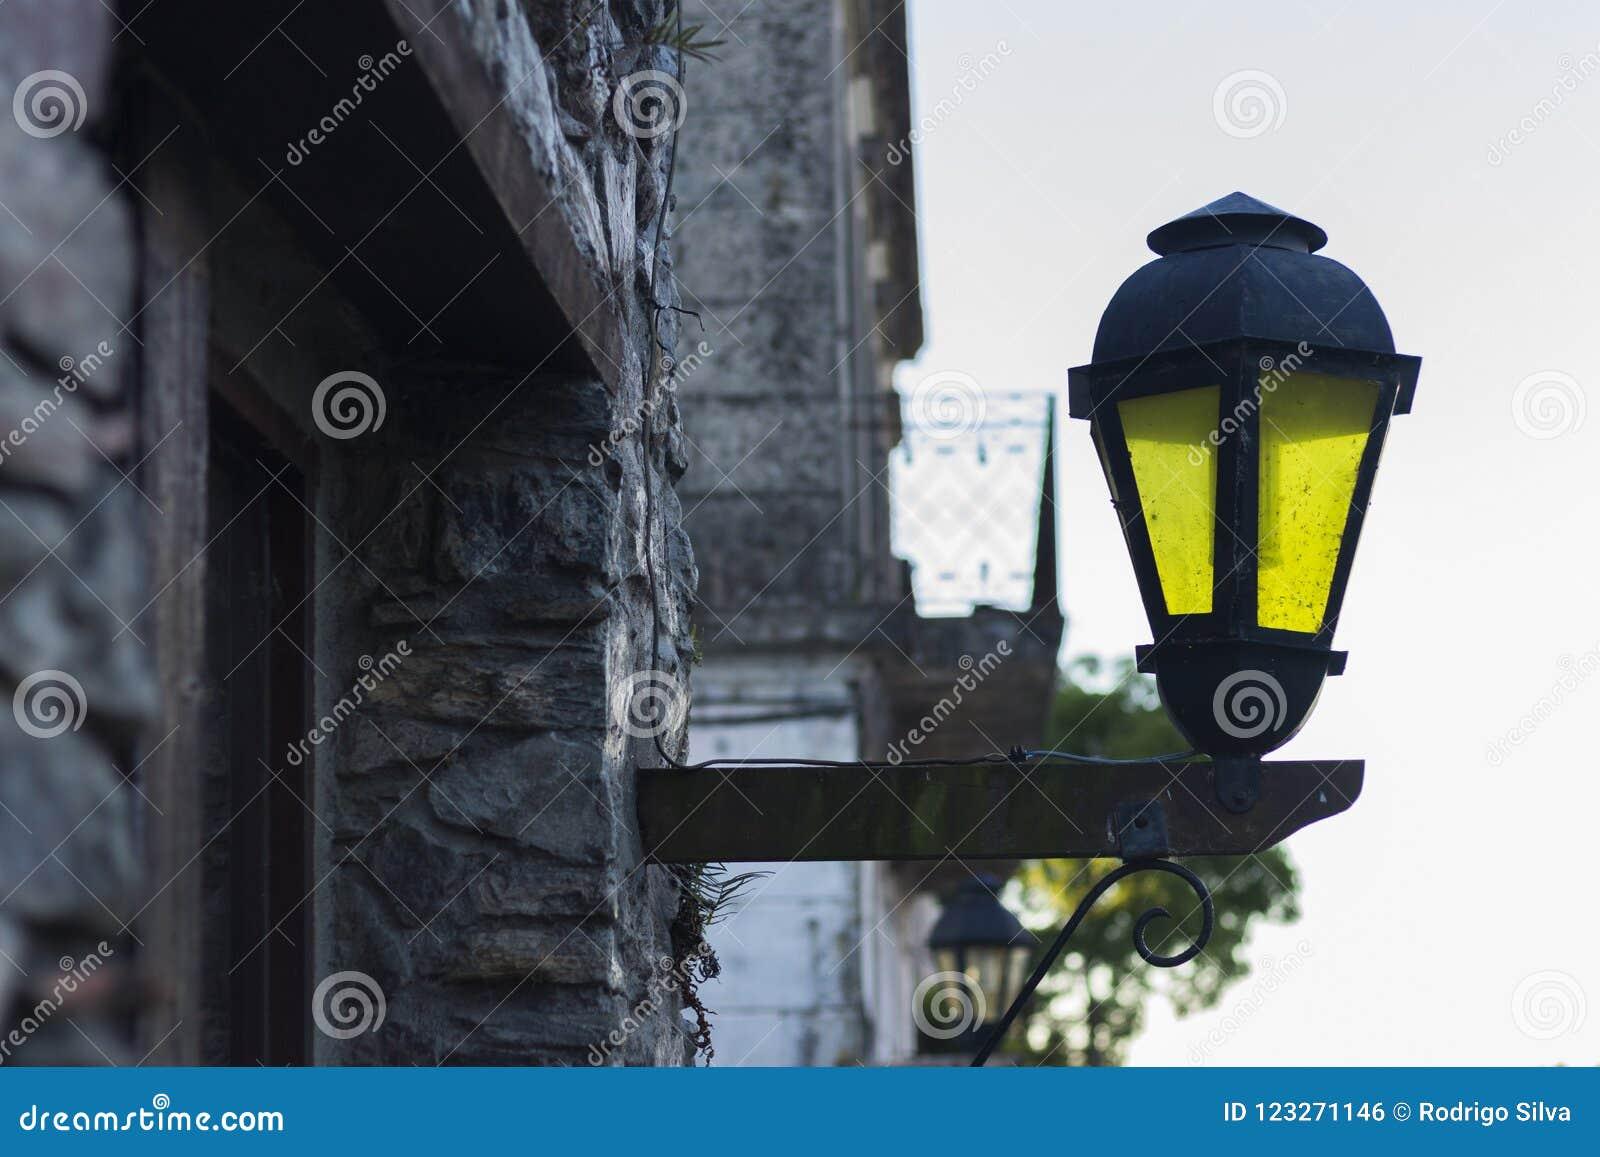 EN GUL LAMPA PÅ GATAN